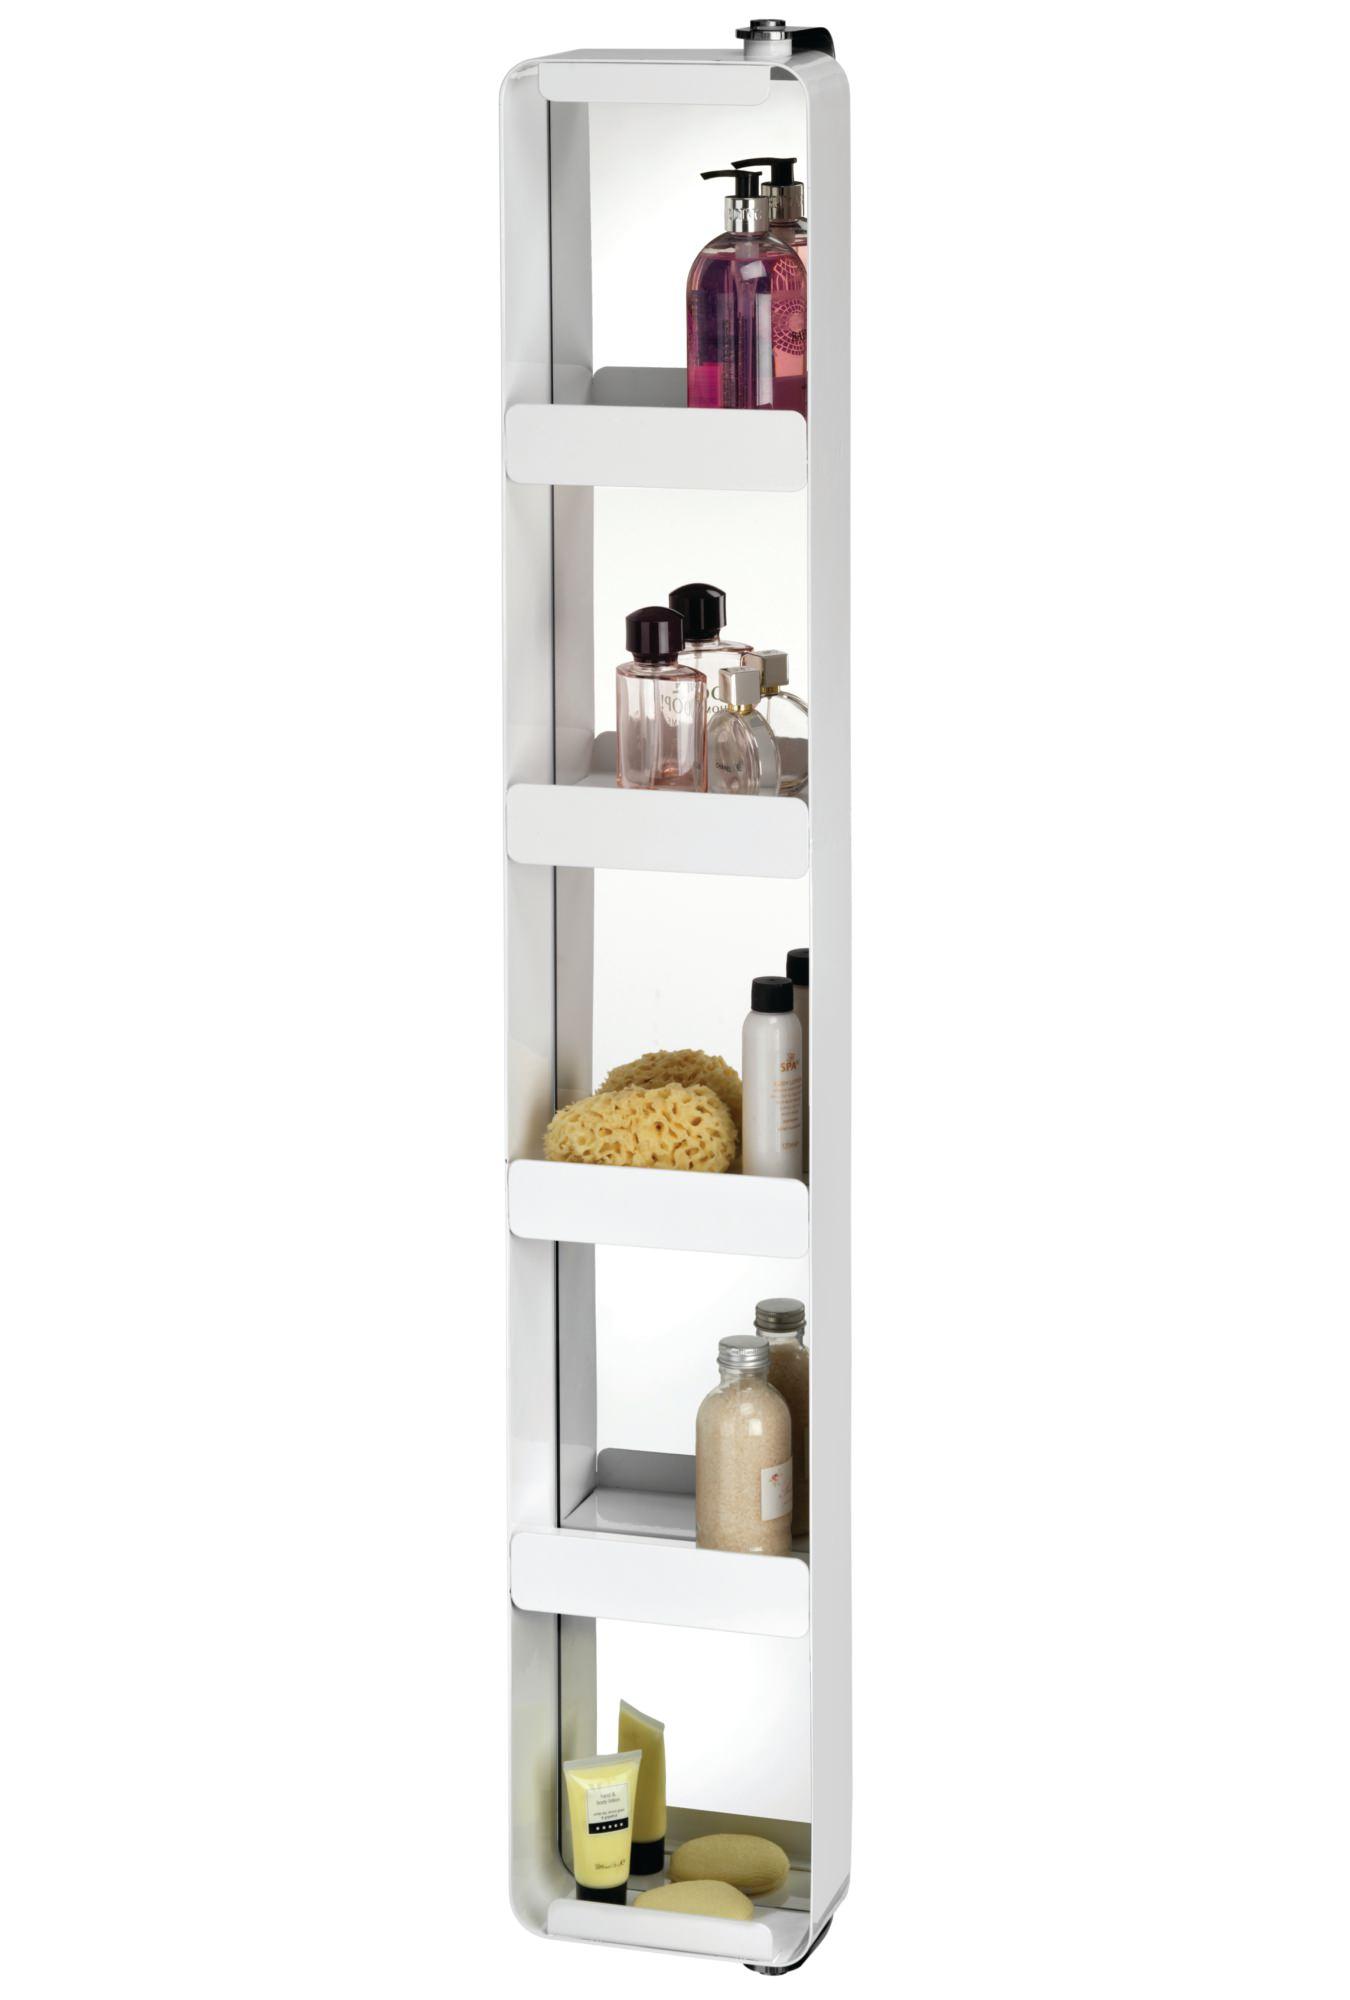 croydex arun mm tall pivoting cabinet middot alternate image of croydex arun mm tall pivoting cabinet: croydex bathroom cabinet